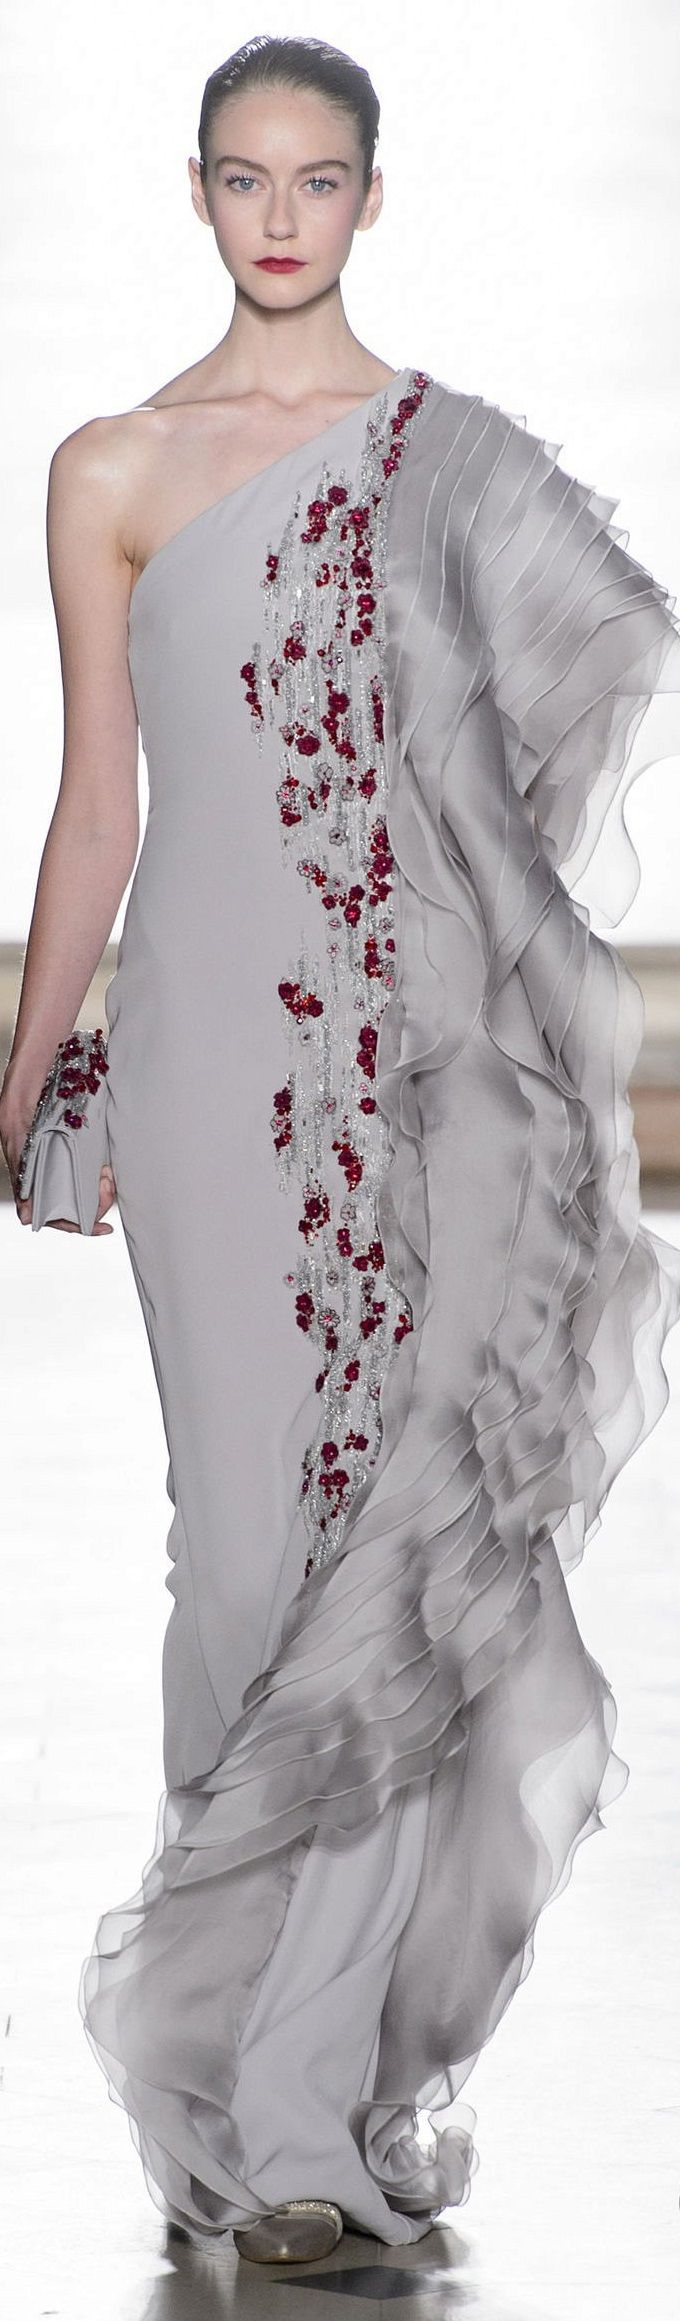 819 best elegant dresses images on Pinterest | Evening gowns, Party ...